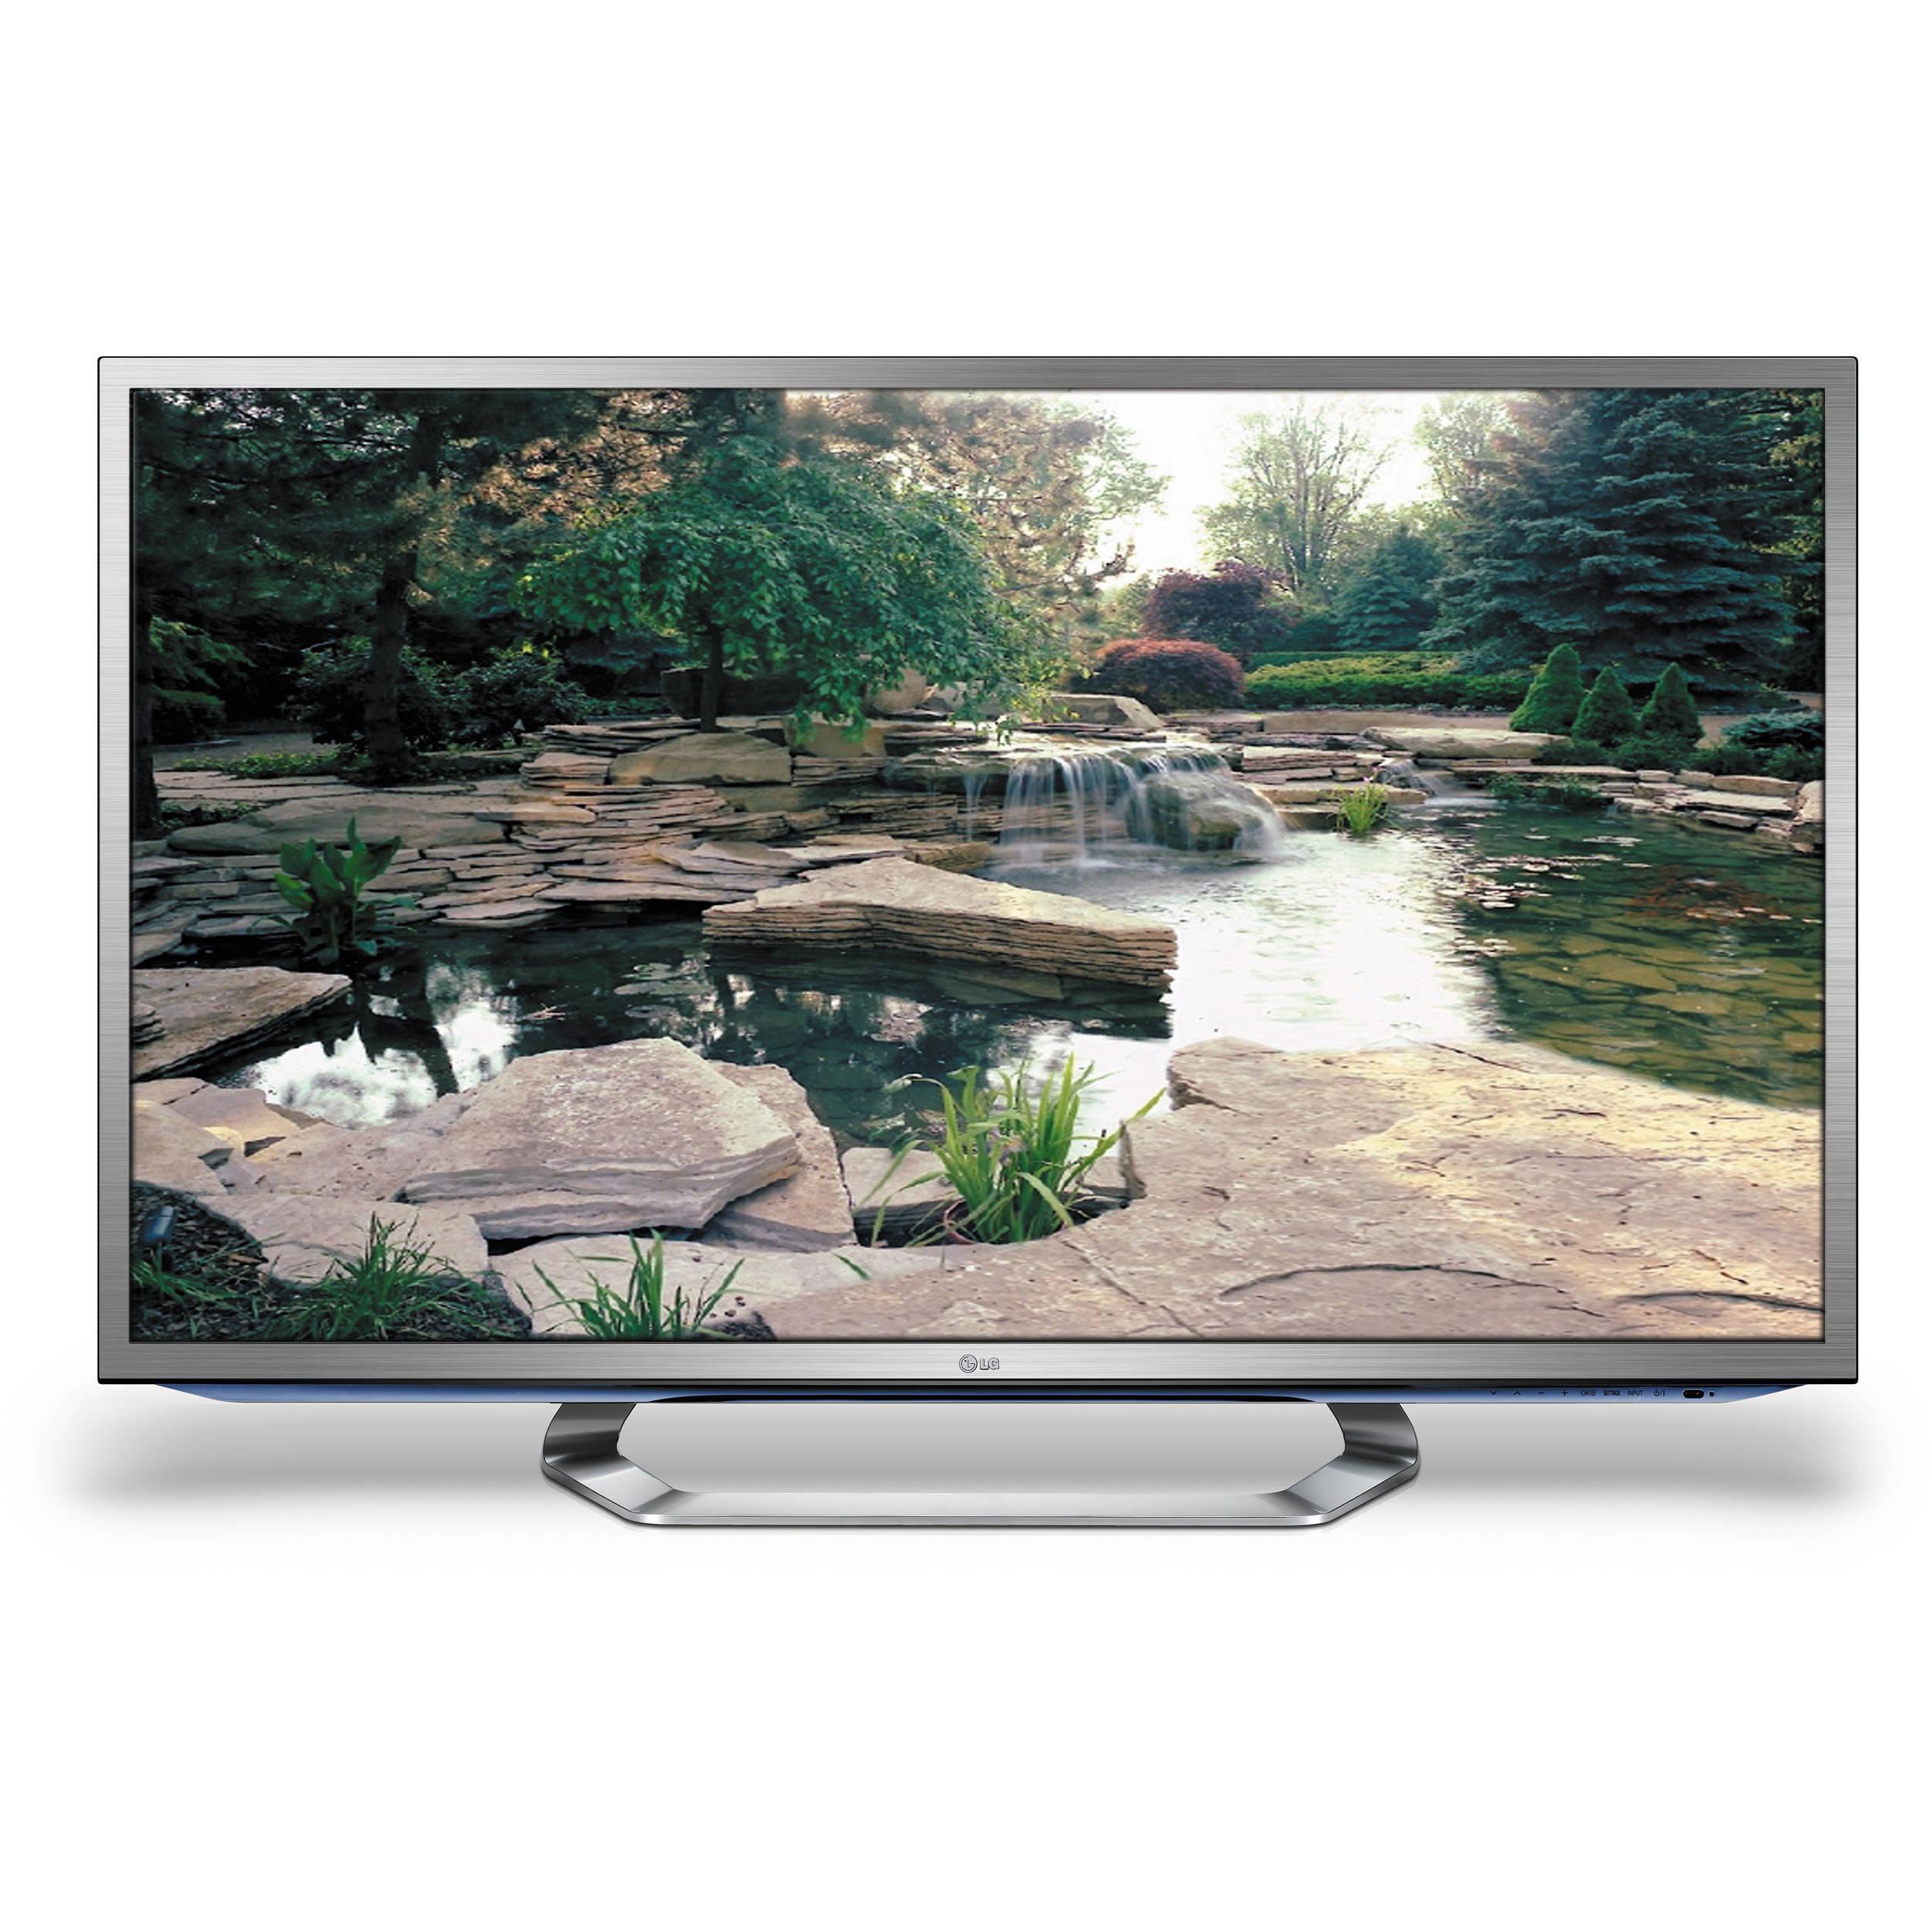 lg 55g2 55 class cinema 3d led google tv 55lmg620 b h rh bhphotovideo com LG G2 microSD Slot LG G2 Unboxing